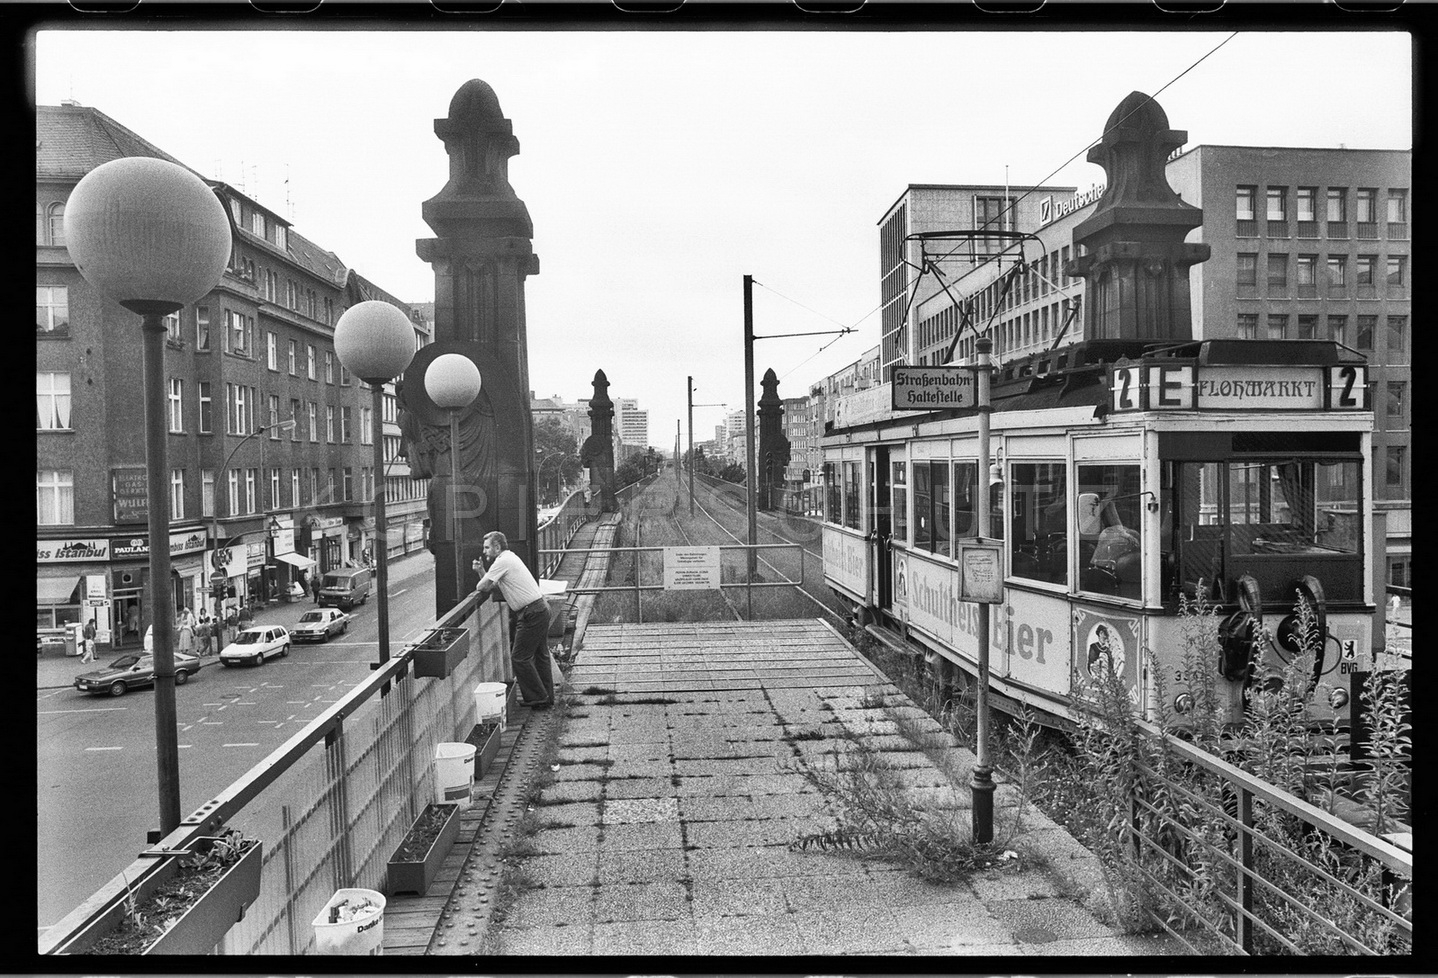 Nr01-022_Bühlowstrasse-11.7.1990